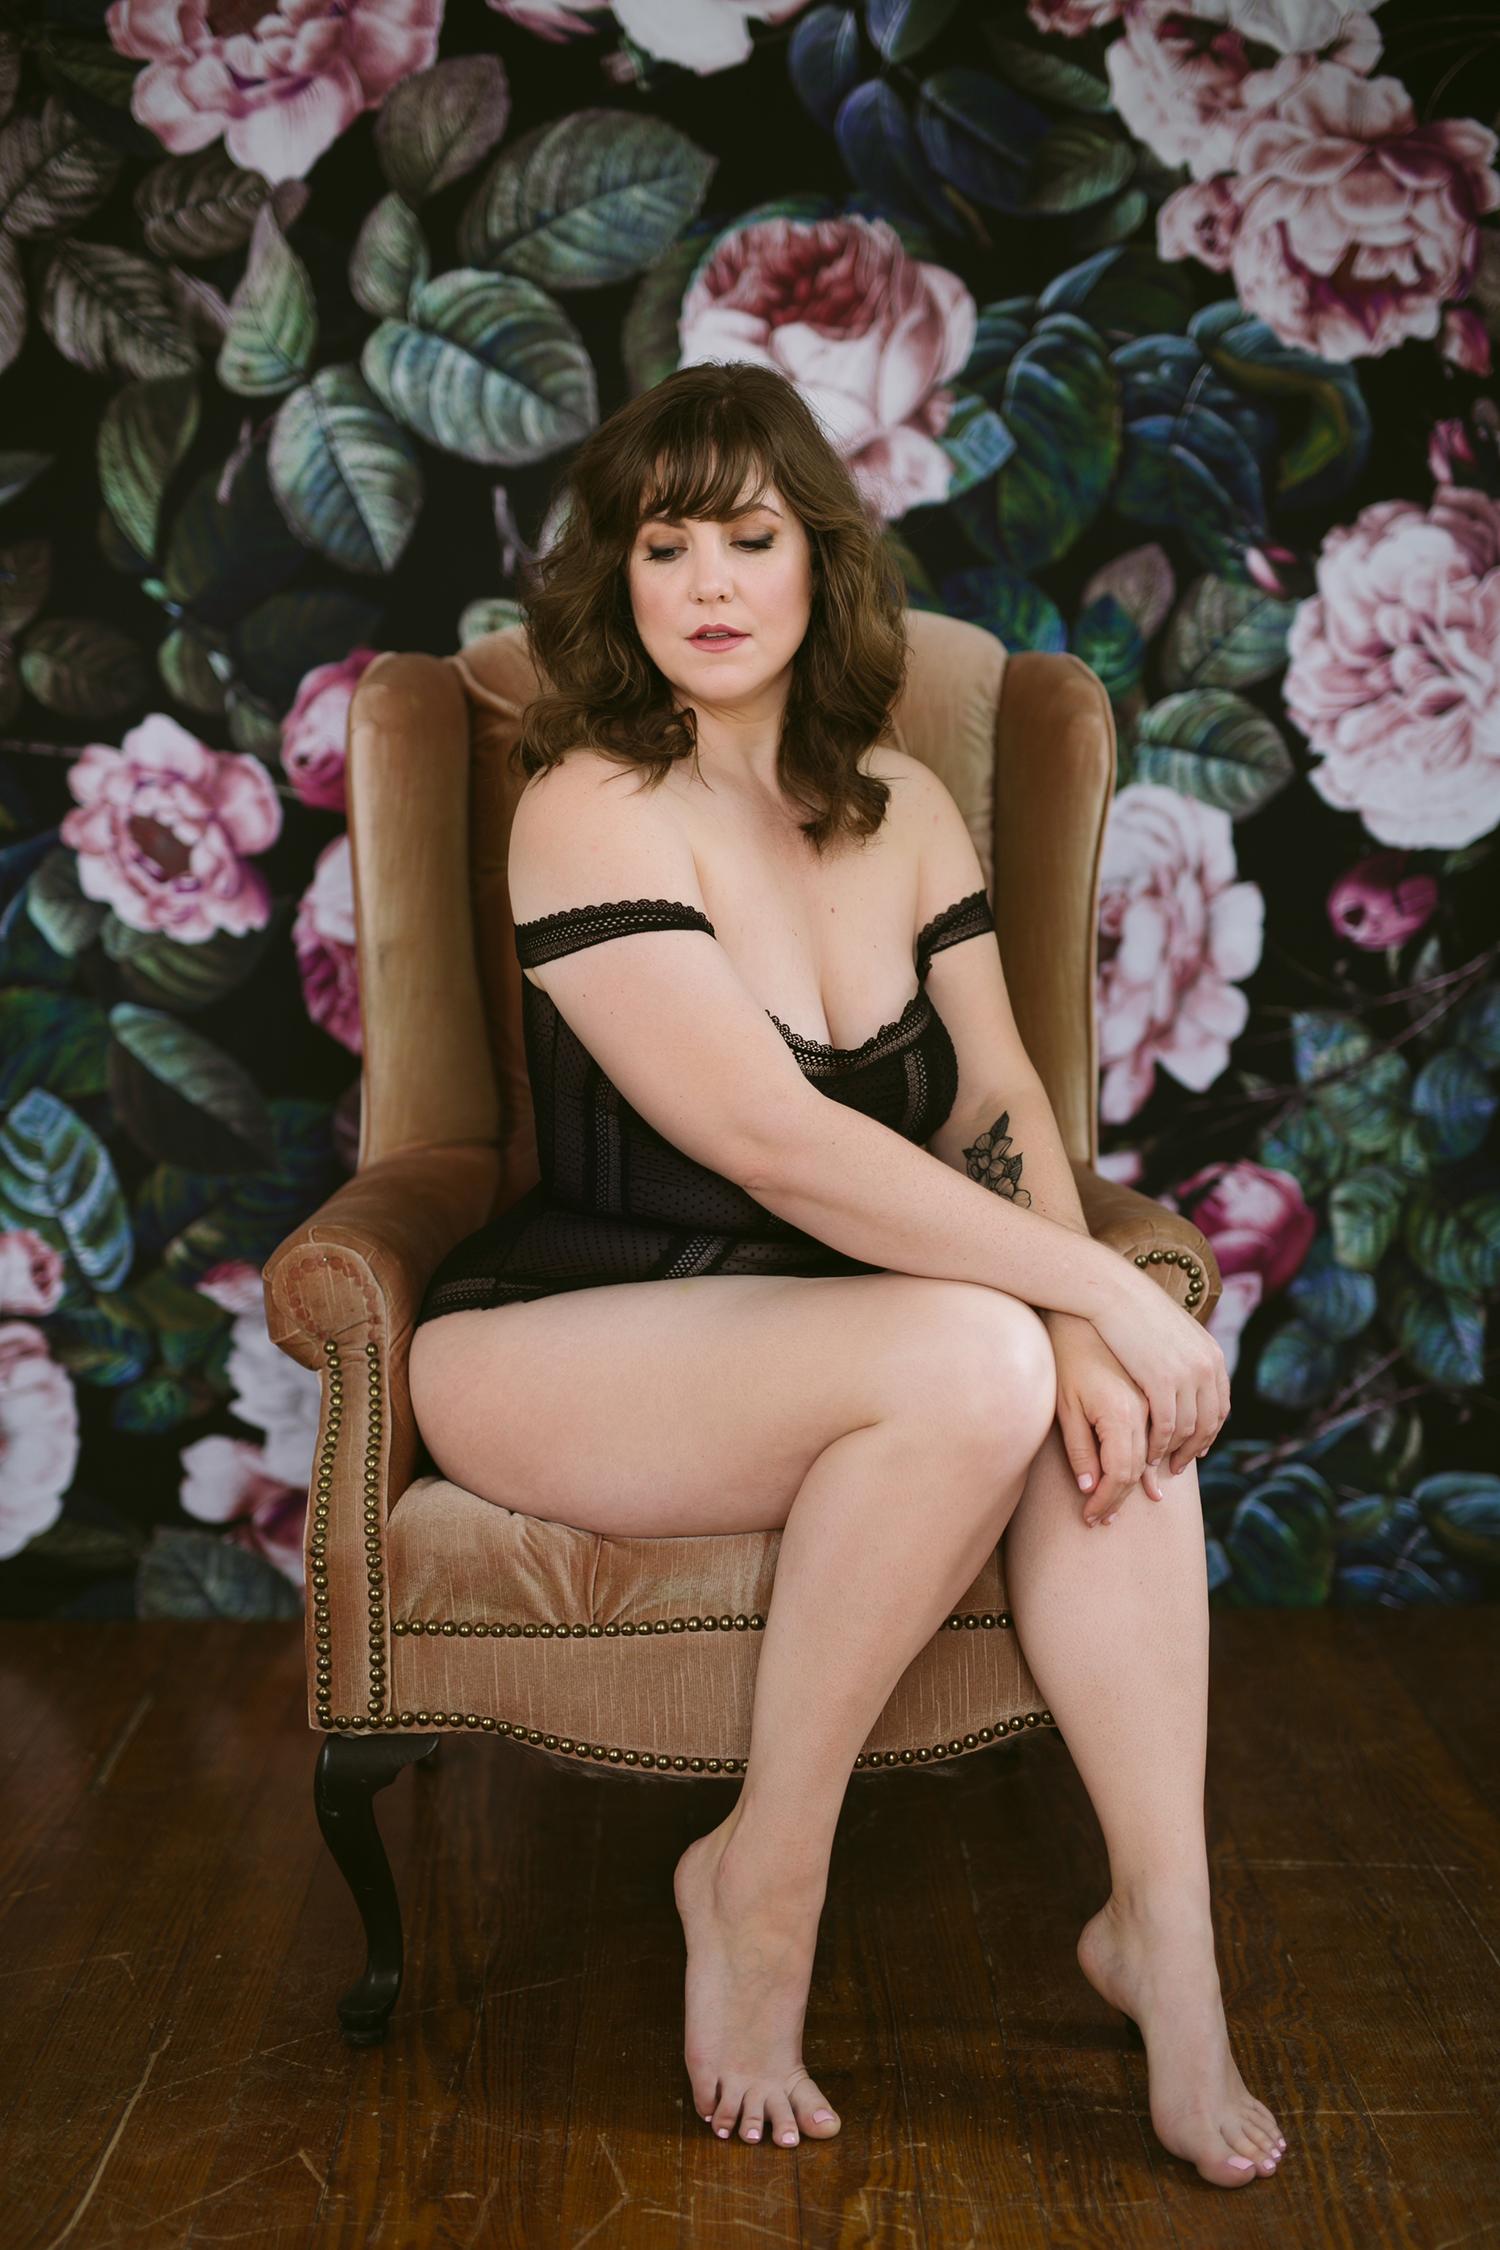 austin-texas-classy-boudoir-photography-KBB26.jpg